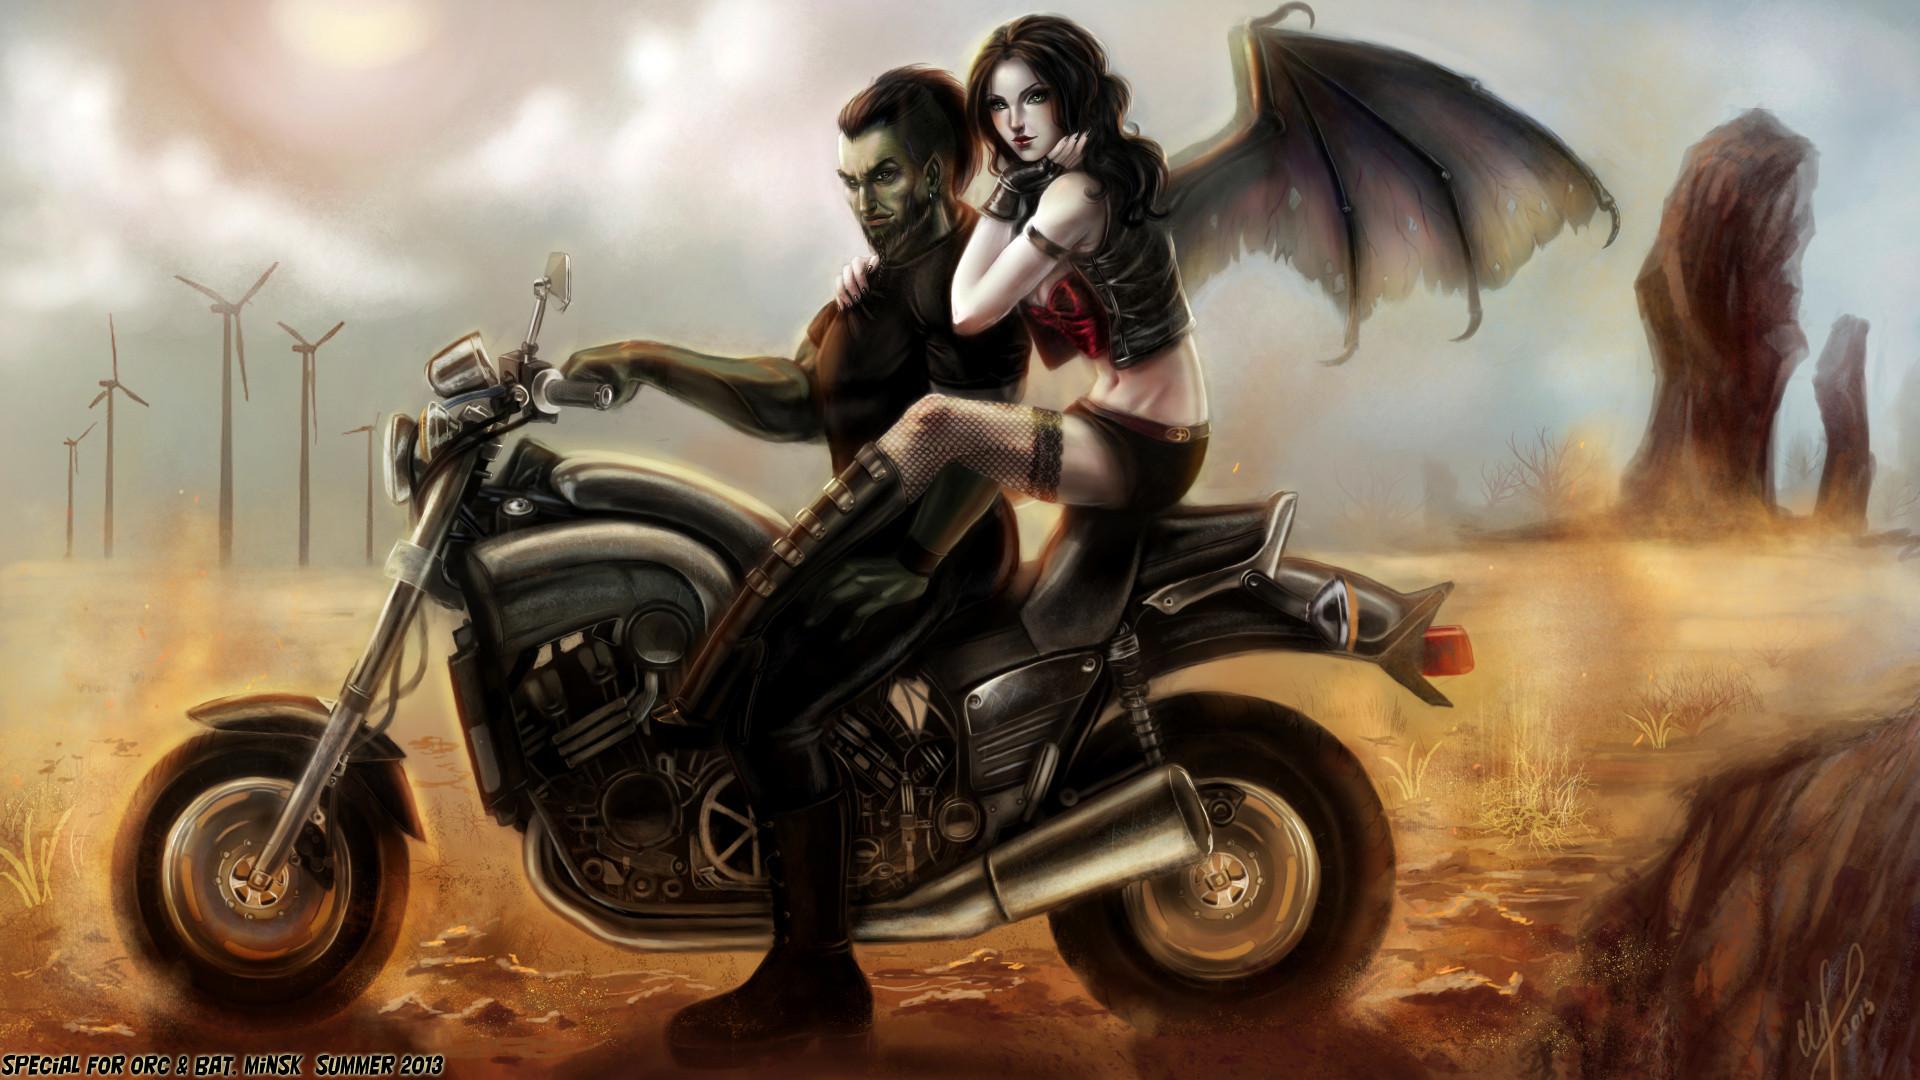 Wallpapers Vampires Men Wings Girls Fantasy Motorcycles Man